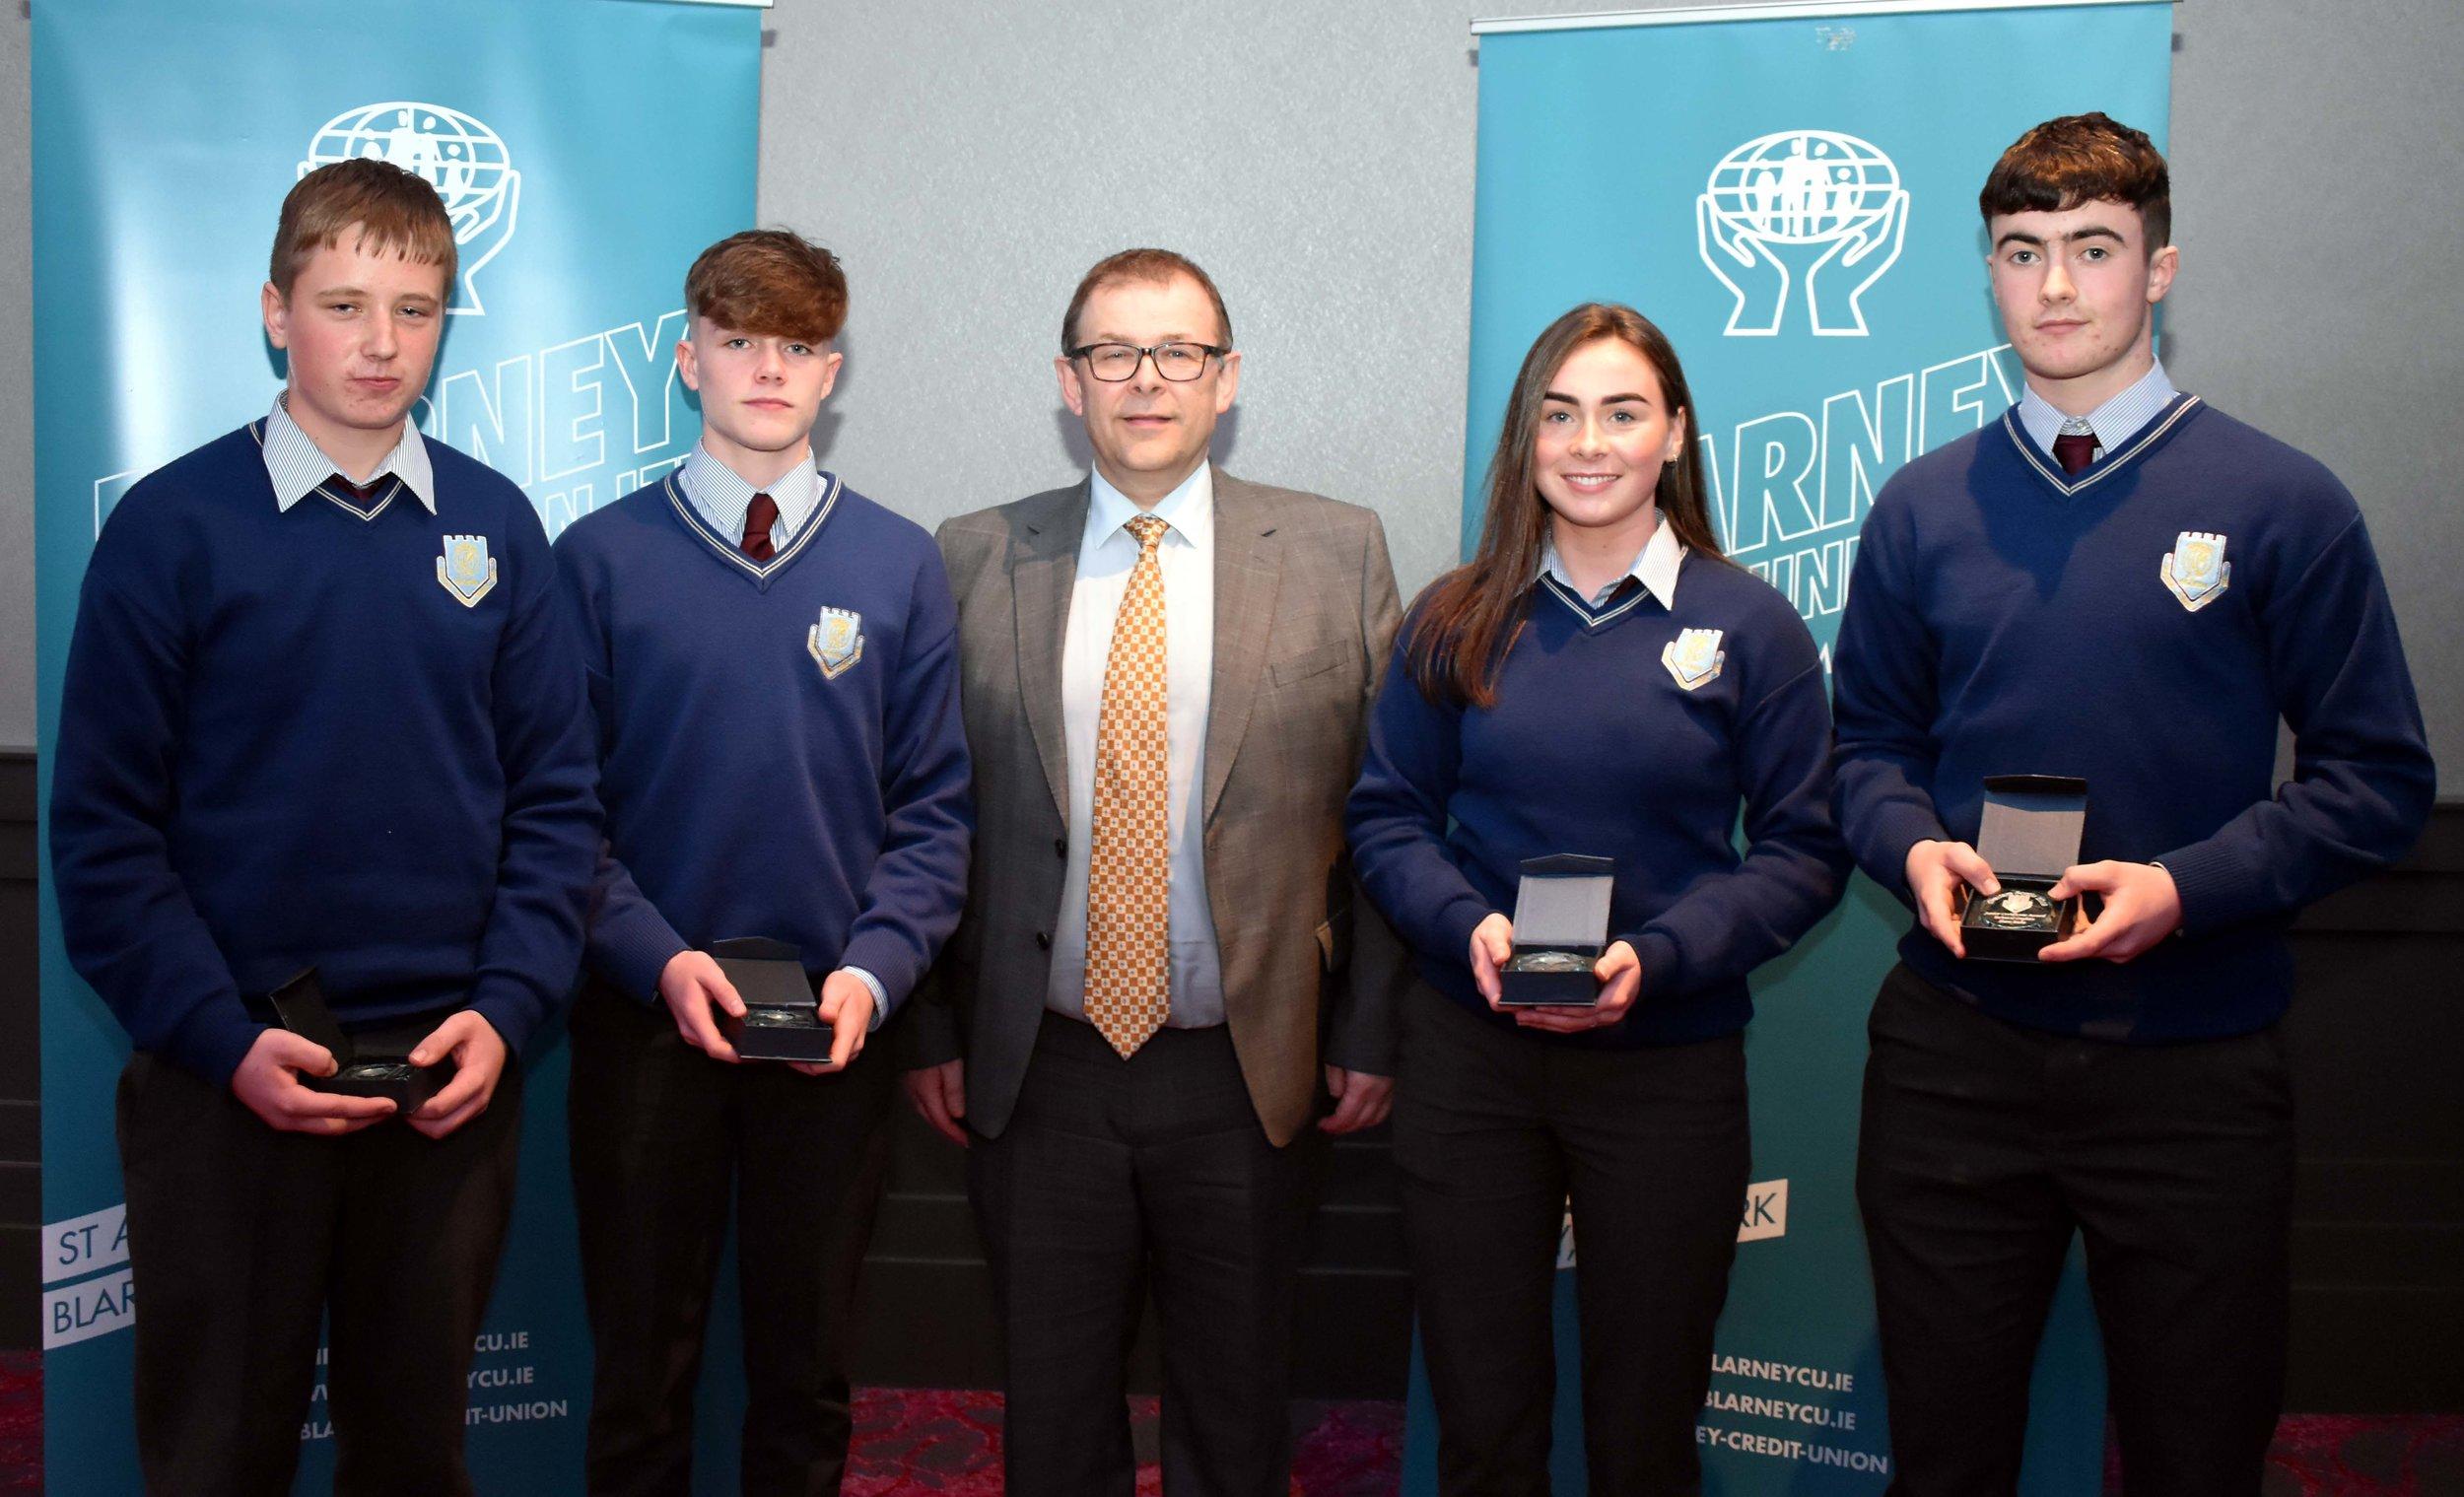 Junior Subject Award winners: Aidan Linehan (Metalwork), Ryan Daly (Music), Orla Cronin (Business Studies), Shane Roche (Technical Graphics) (Pictured with Mr Mark McGloughlin - BOM and Blarney Credit Union)